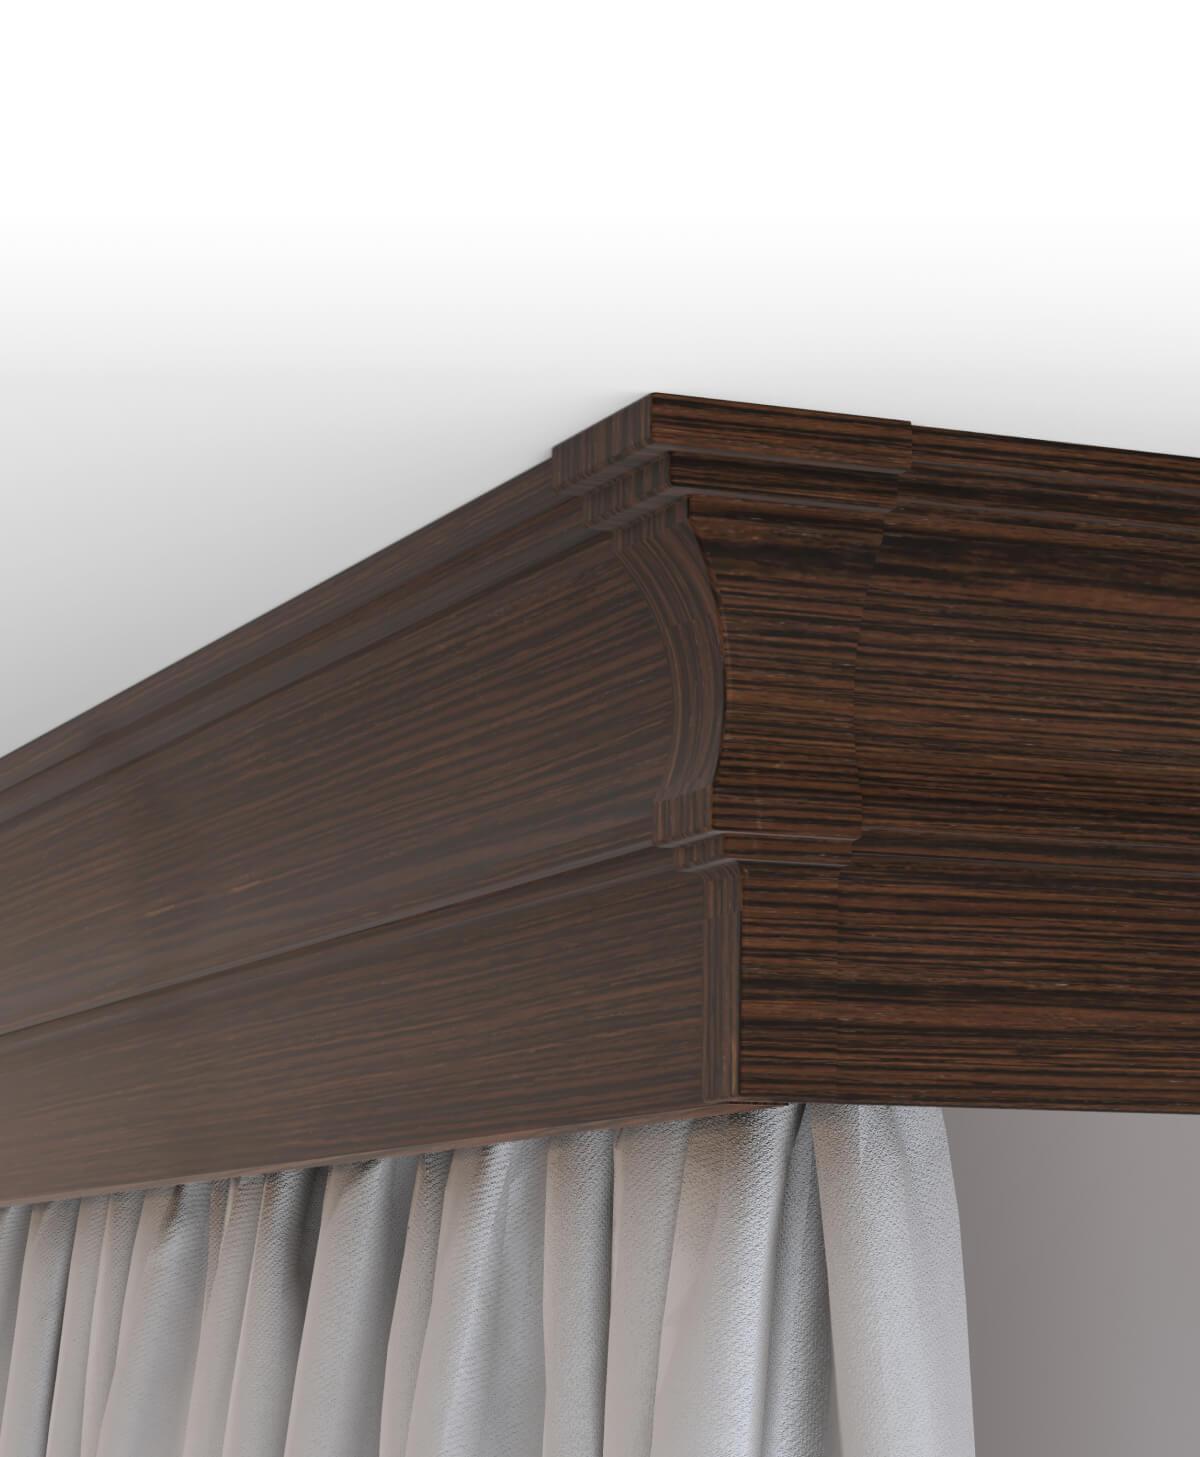 Slimflex dekoratif kapak 1